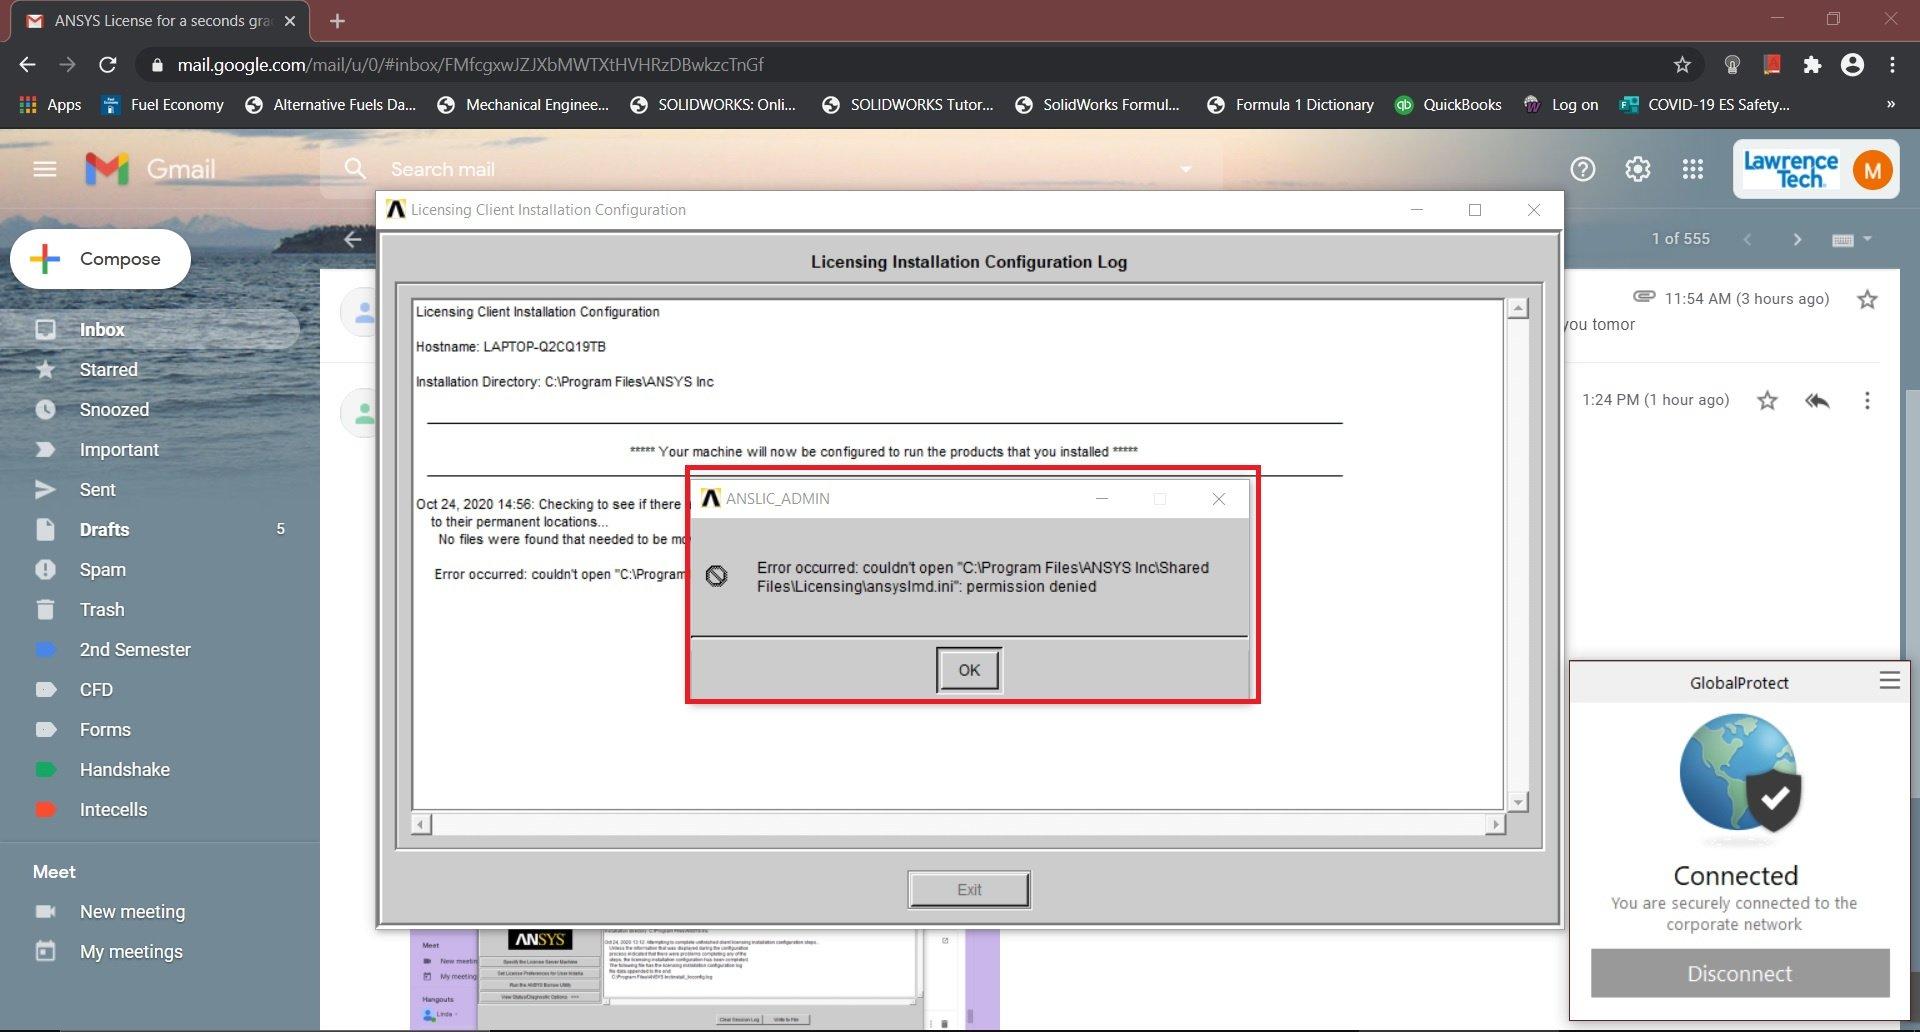 License Installation Configuration Log 1.jpg